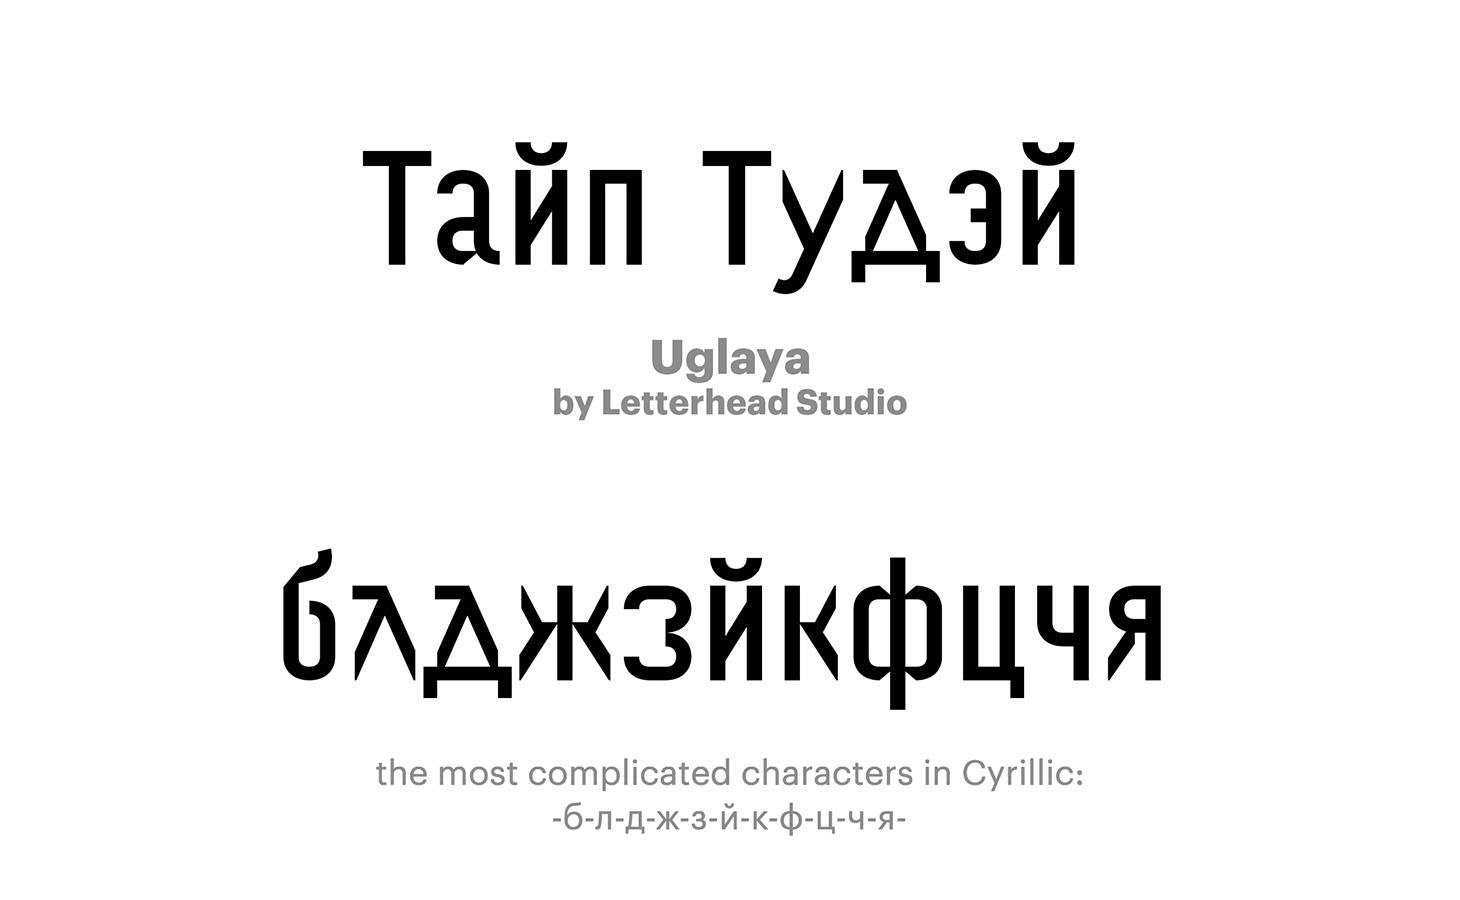 Uglaya